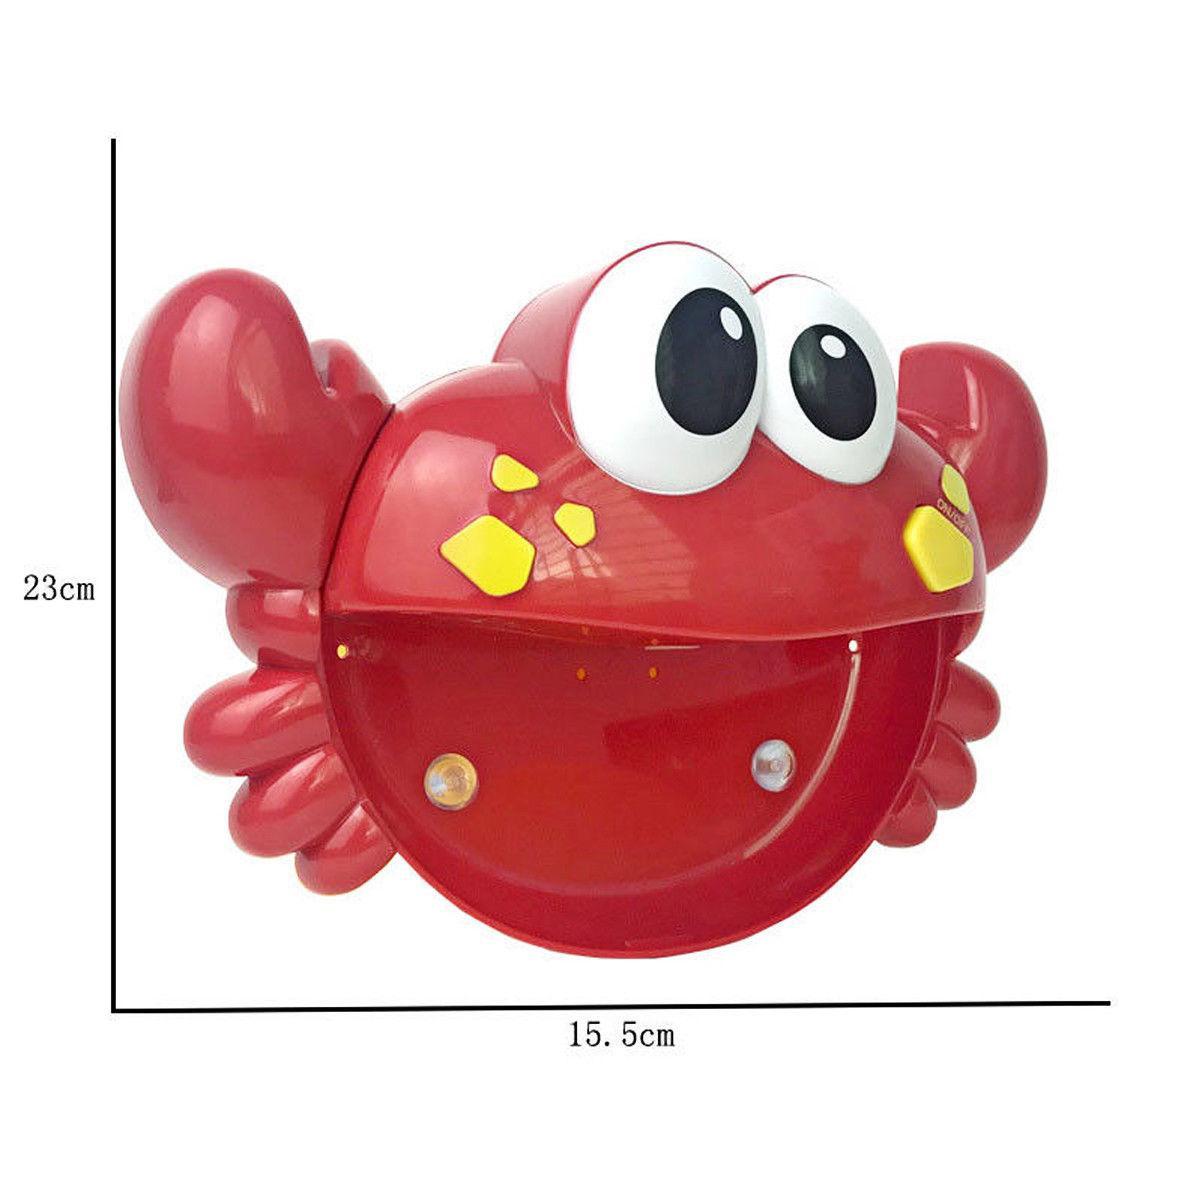 Cute Crab Bubble Machine Musical Bubble Maker Bath Baby Kid Toy Shower Fun Toy